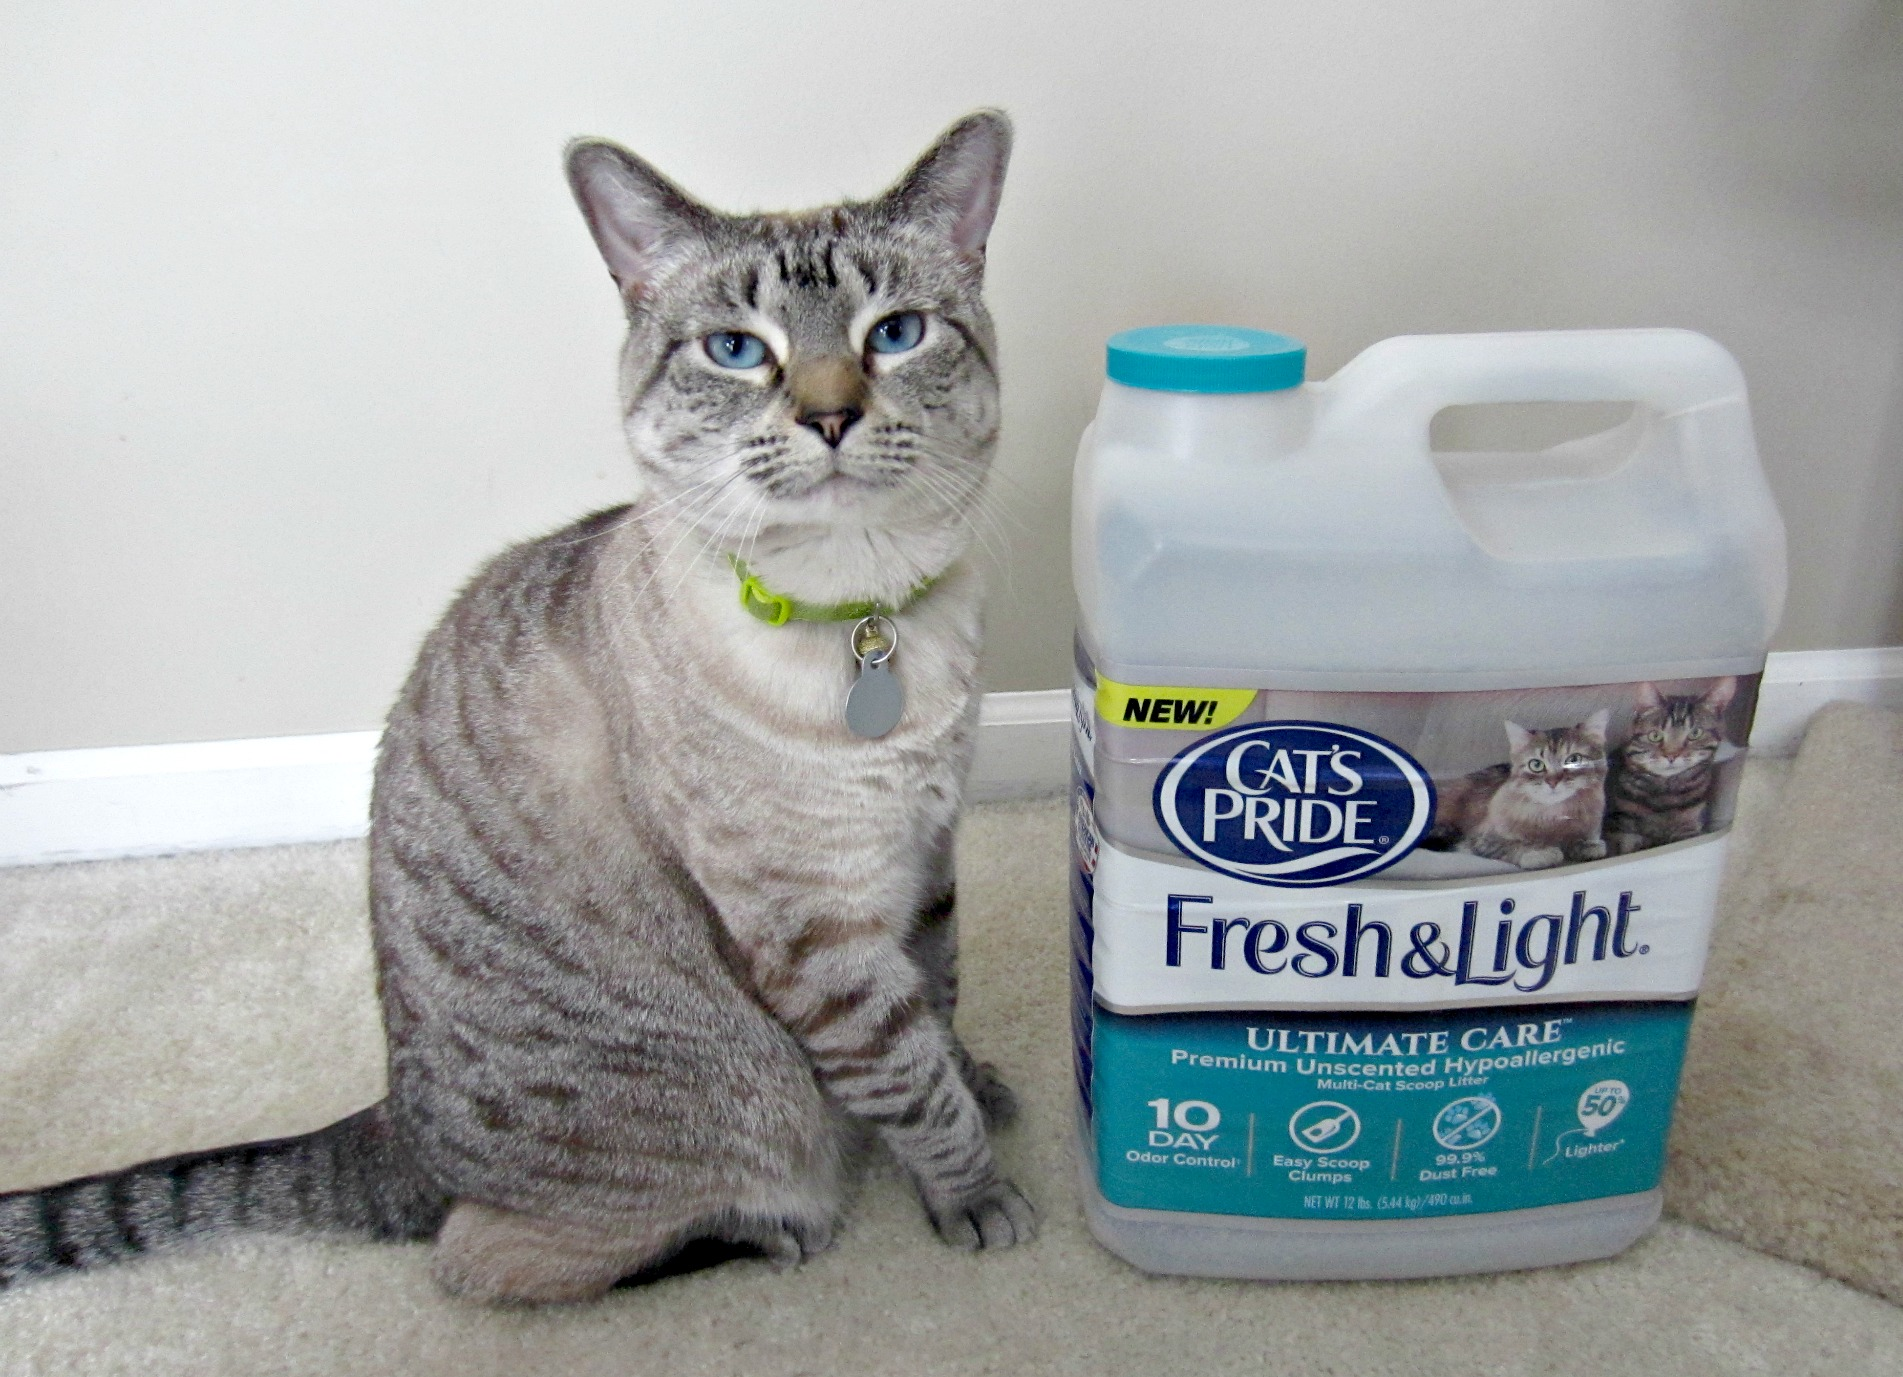 Aspen with cat's pride fresh & light ultimate care cat litter